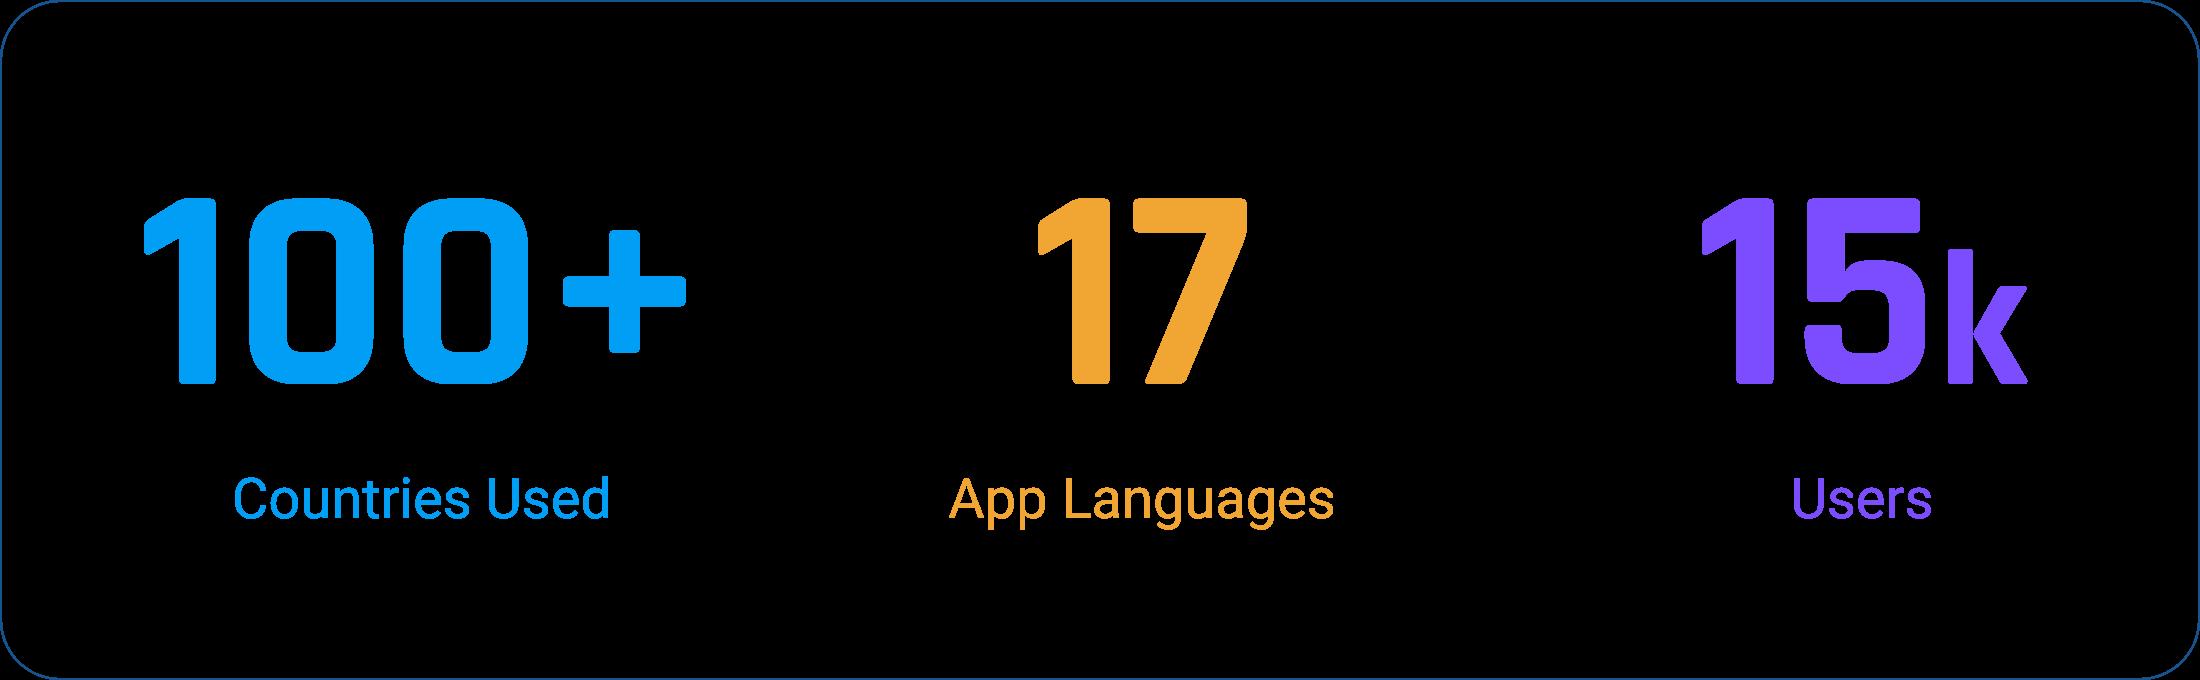 Plannerly BIM Management App User Numbers